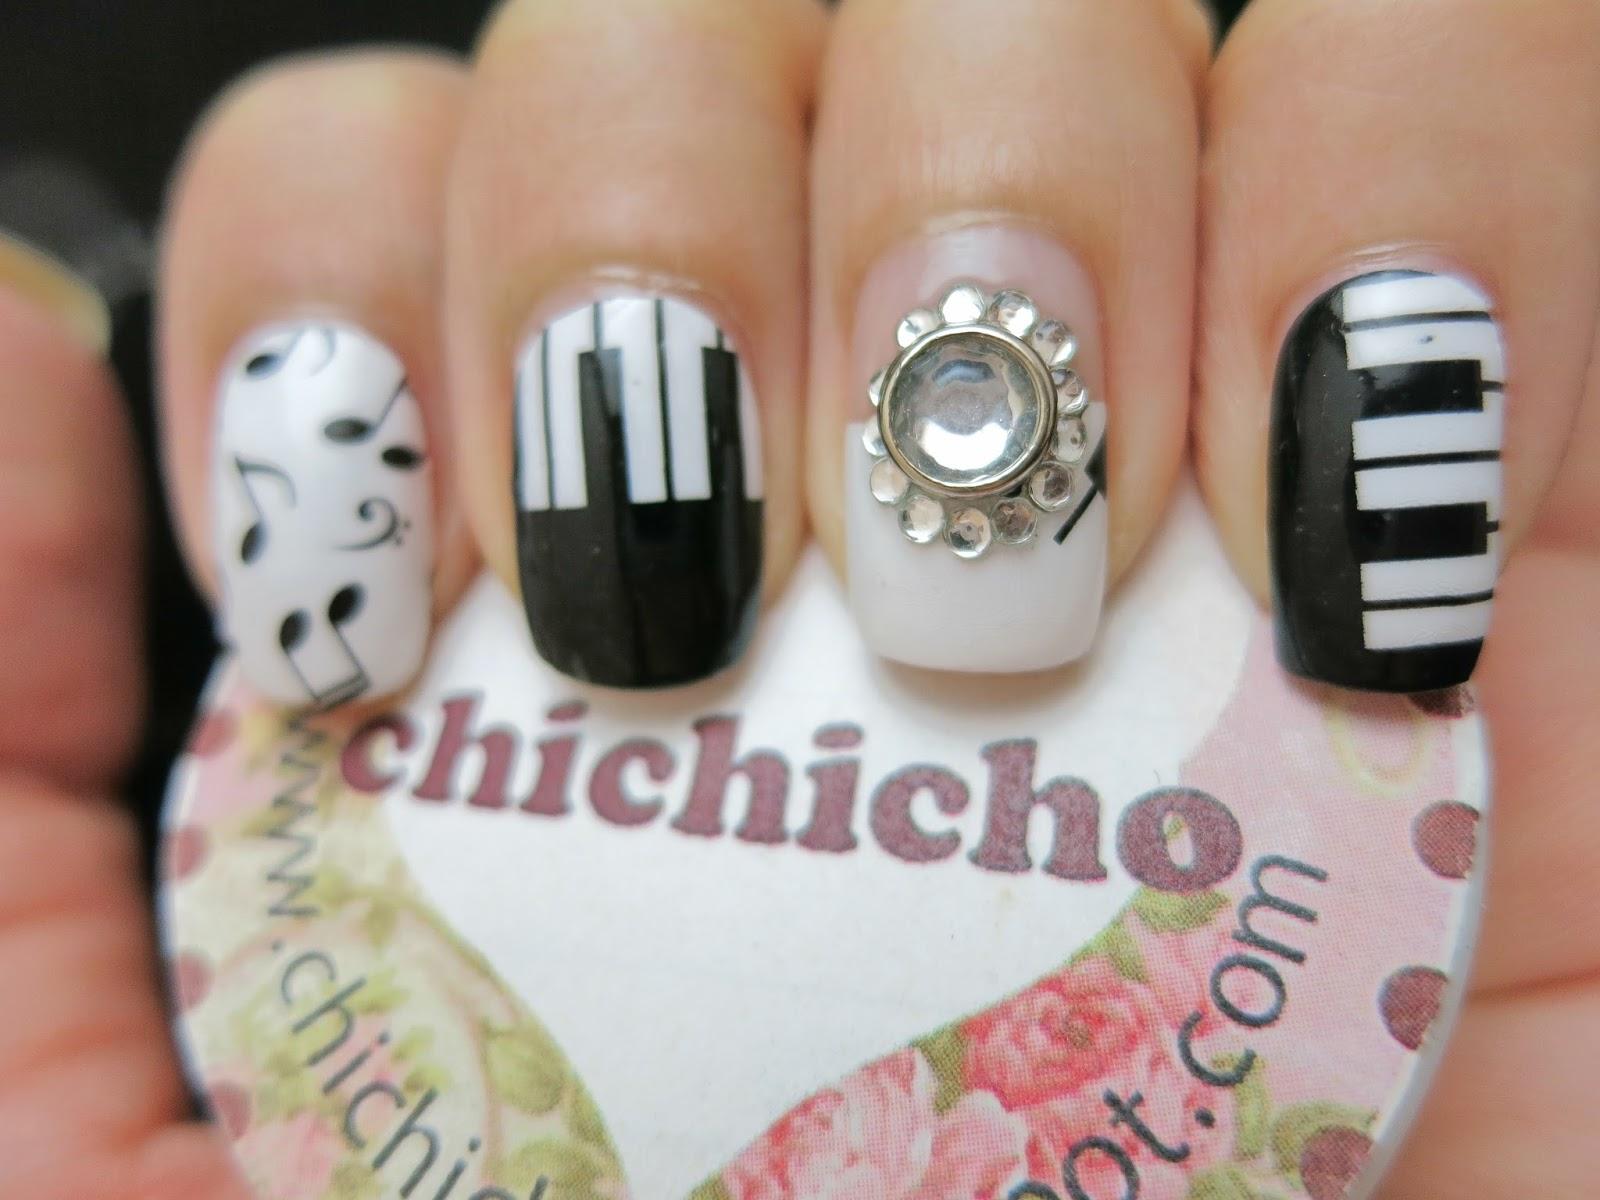 Piano and Music Nail Art Nail Wrap S1257 - chichicho~